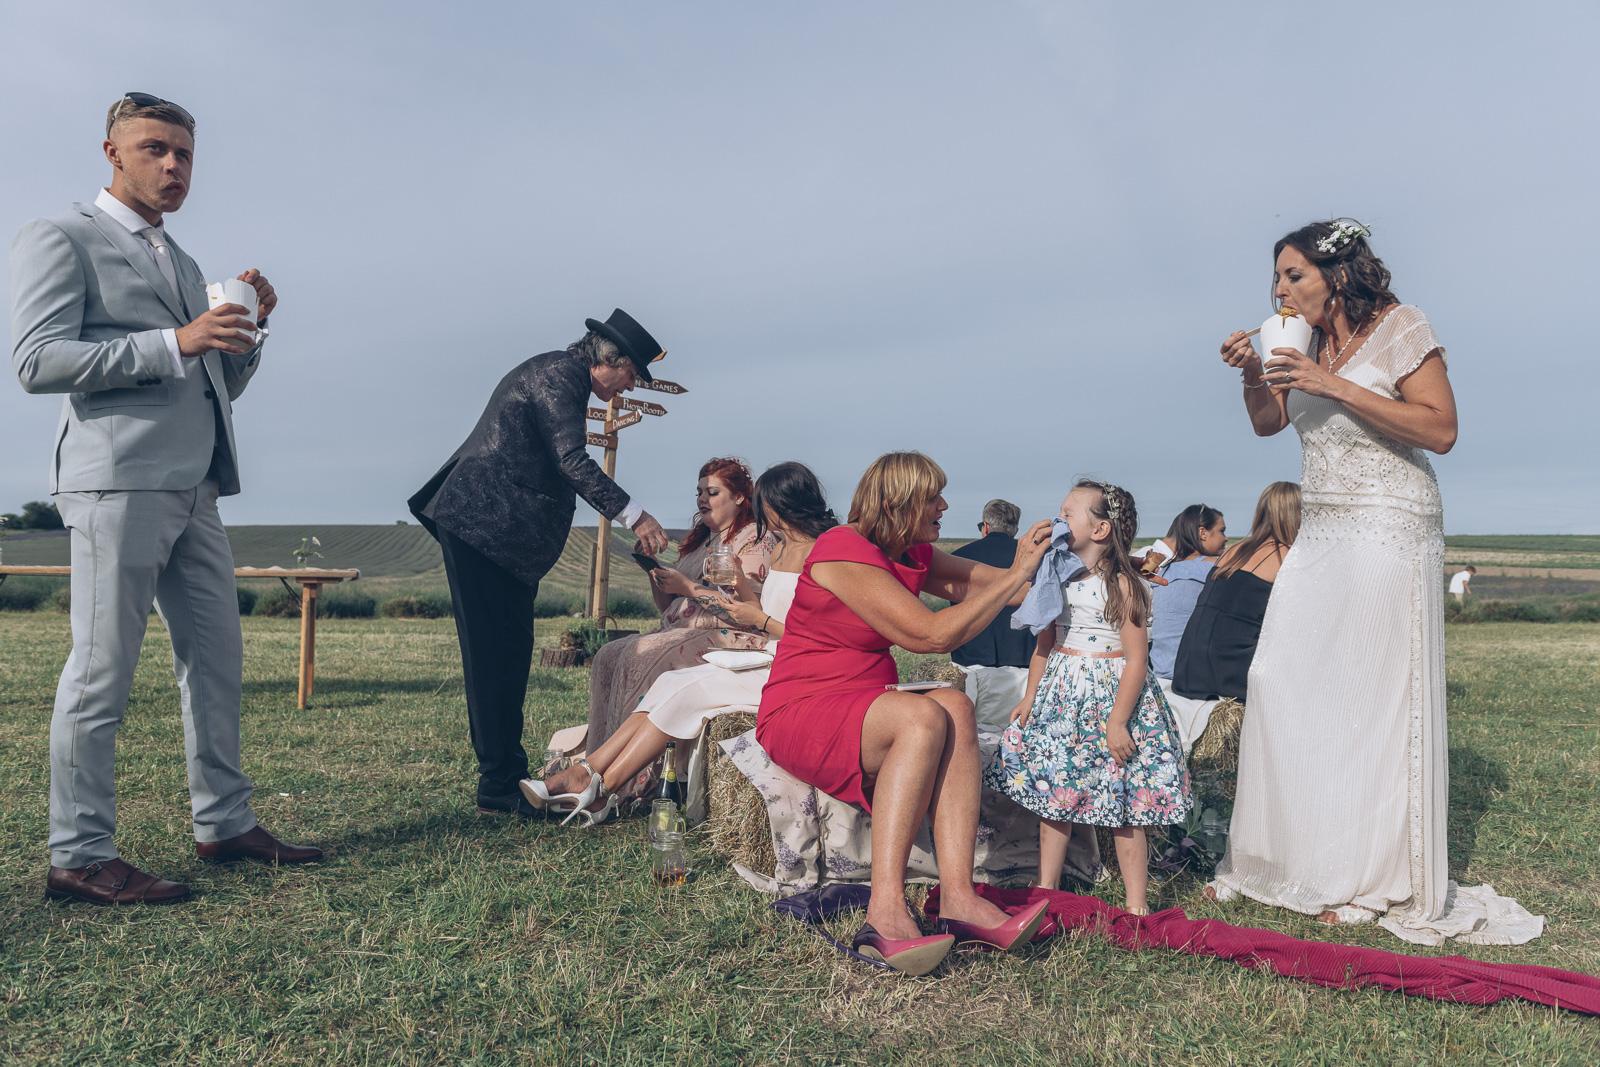 048 Wedding Photographer Hitchin © Erica Hawkins Photography